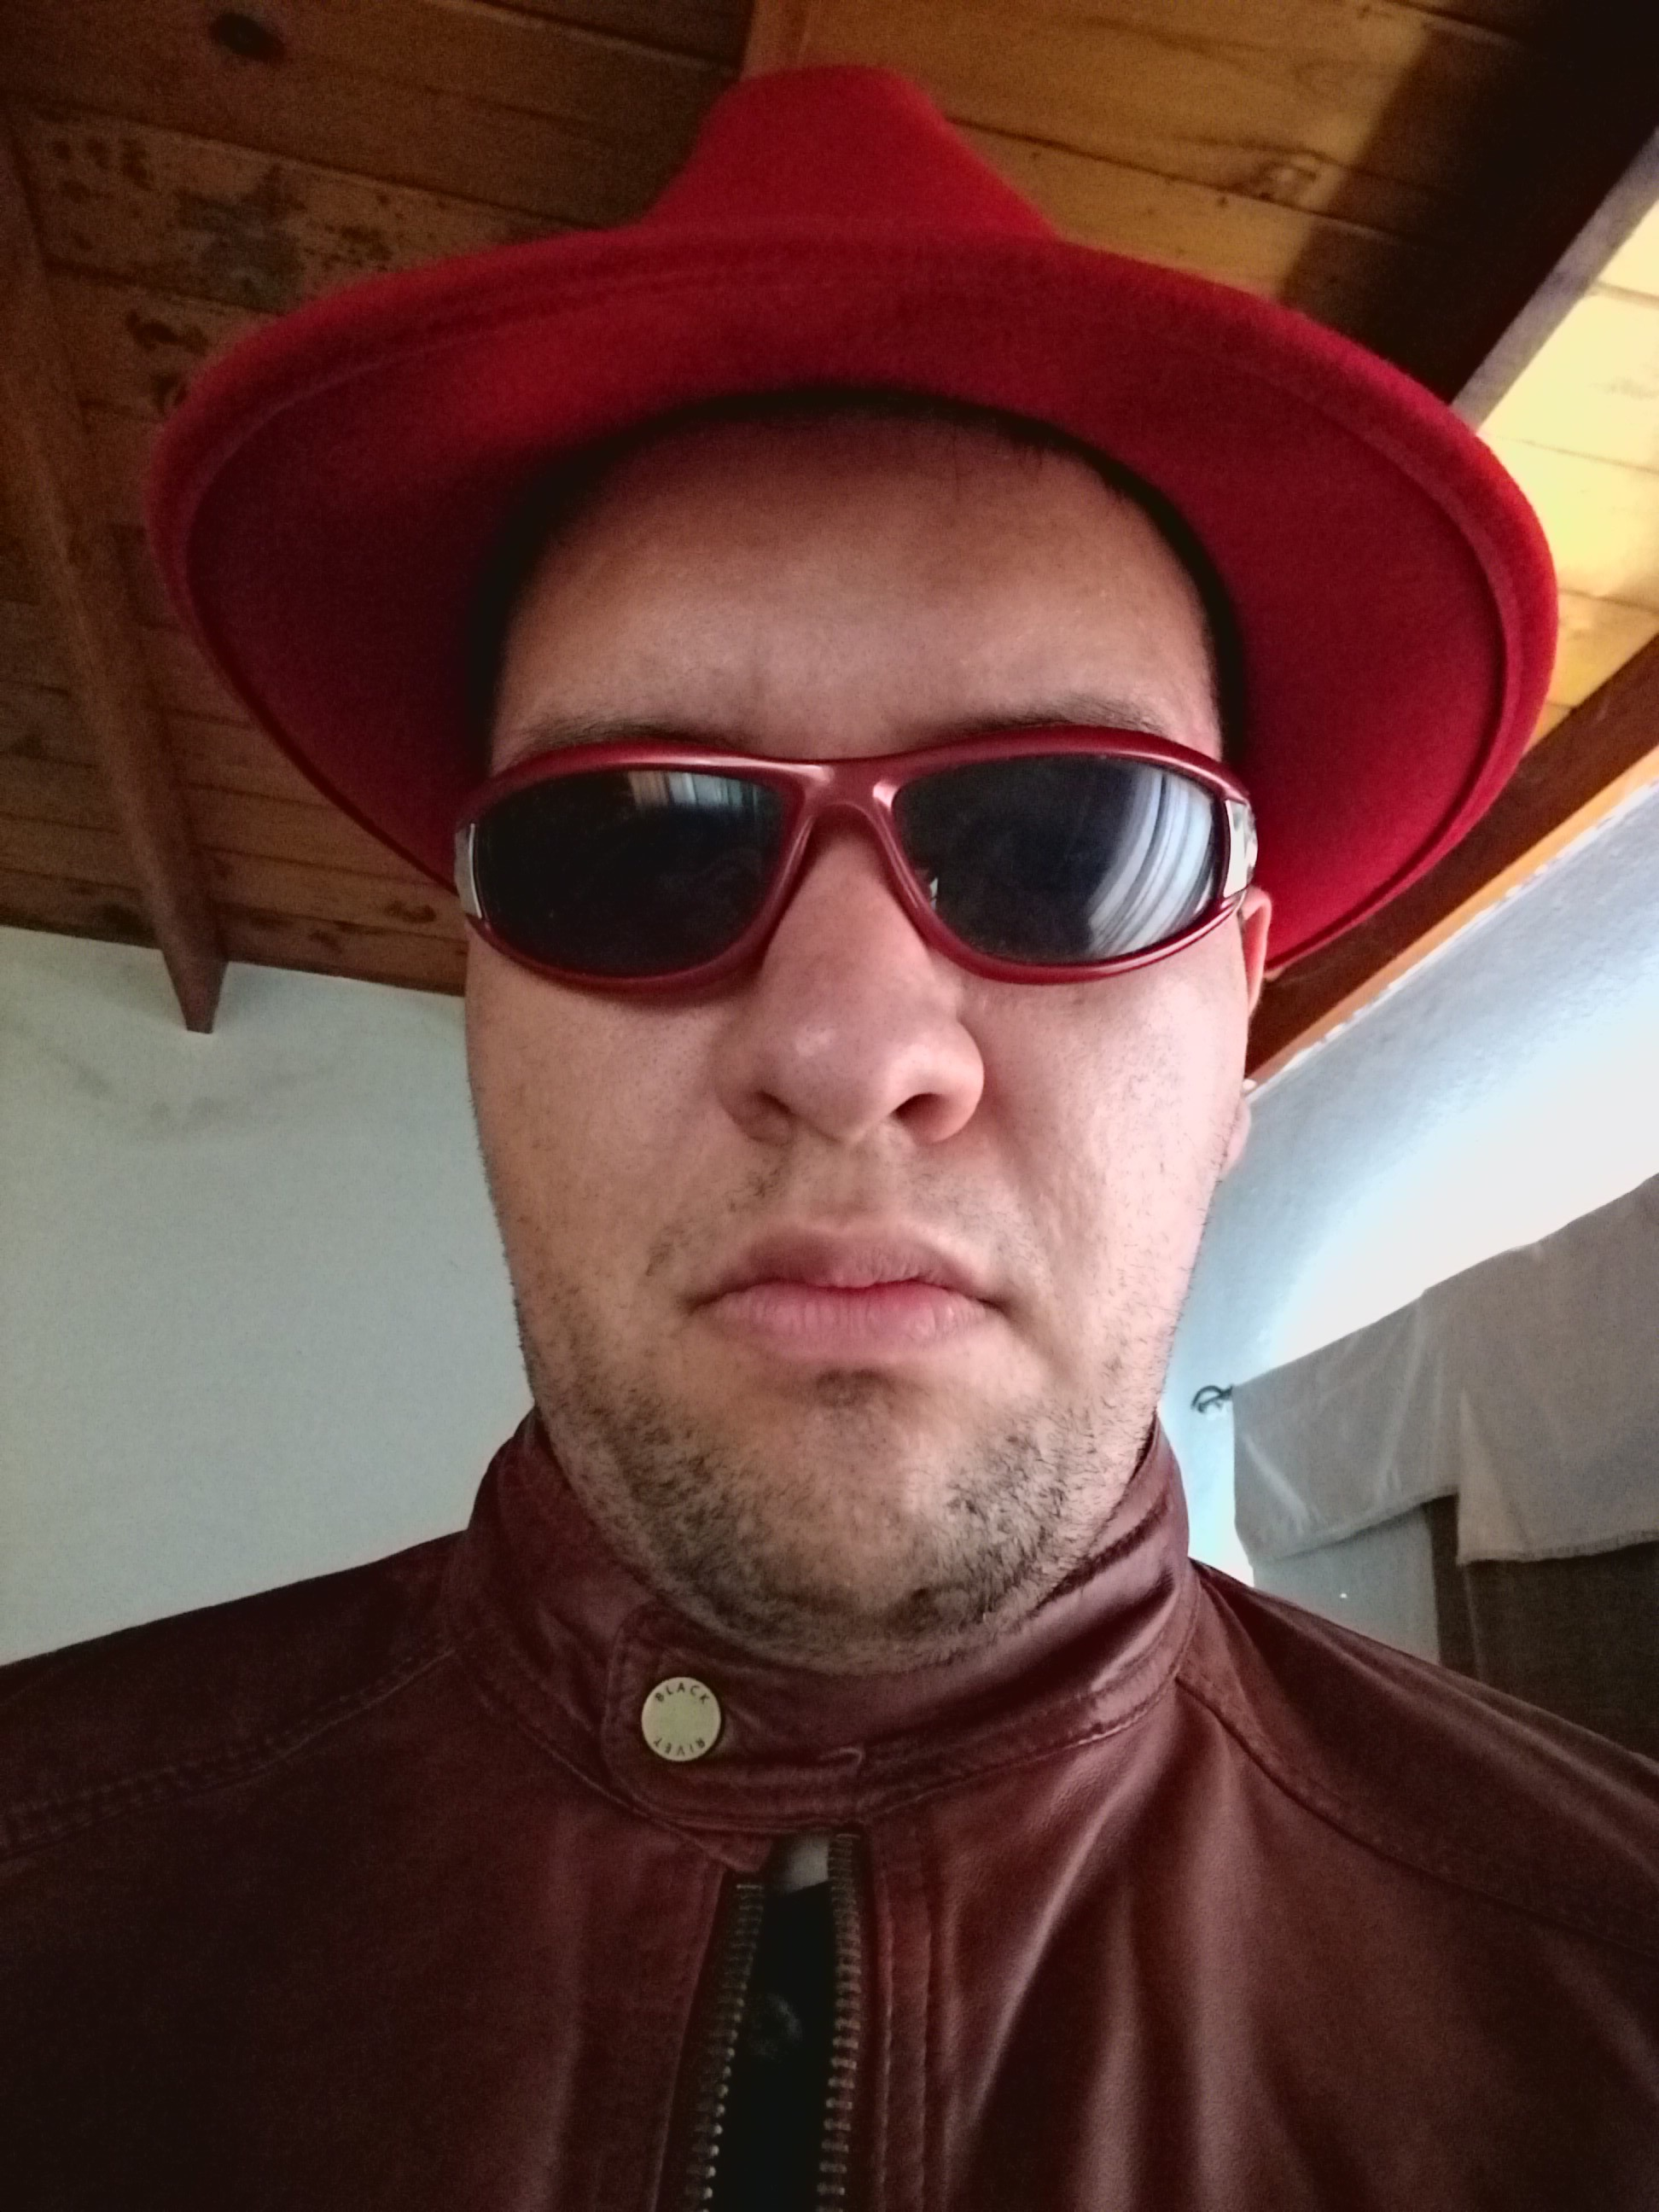 AntonioAlexisHuerta's Profile Picture